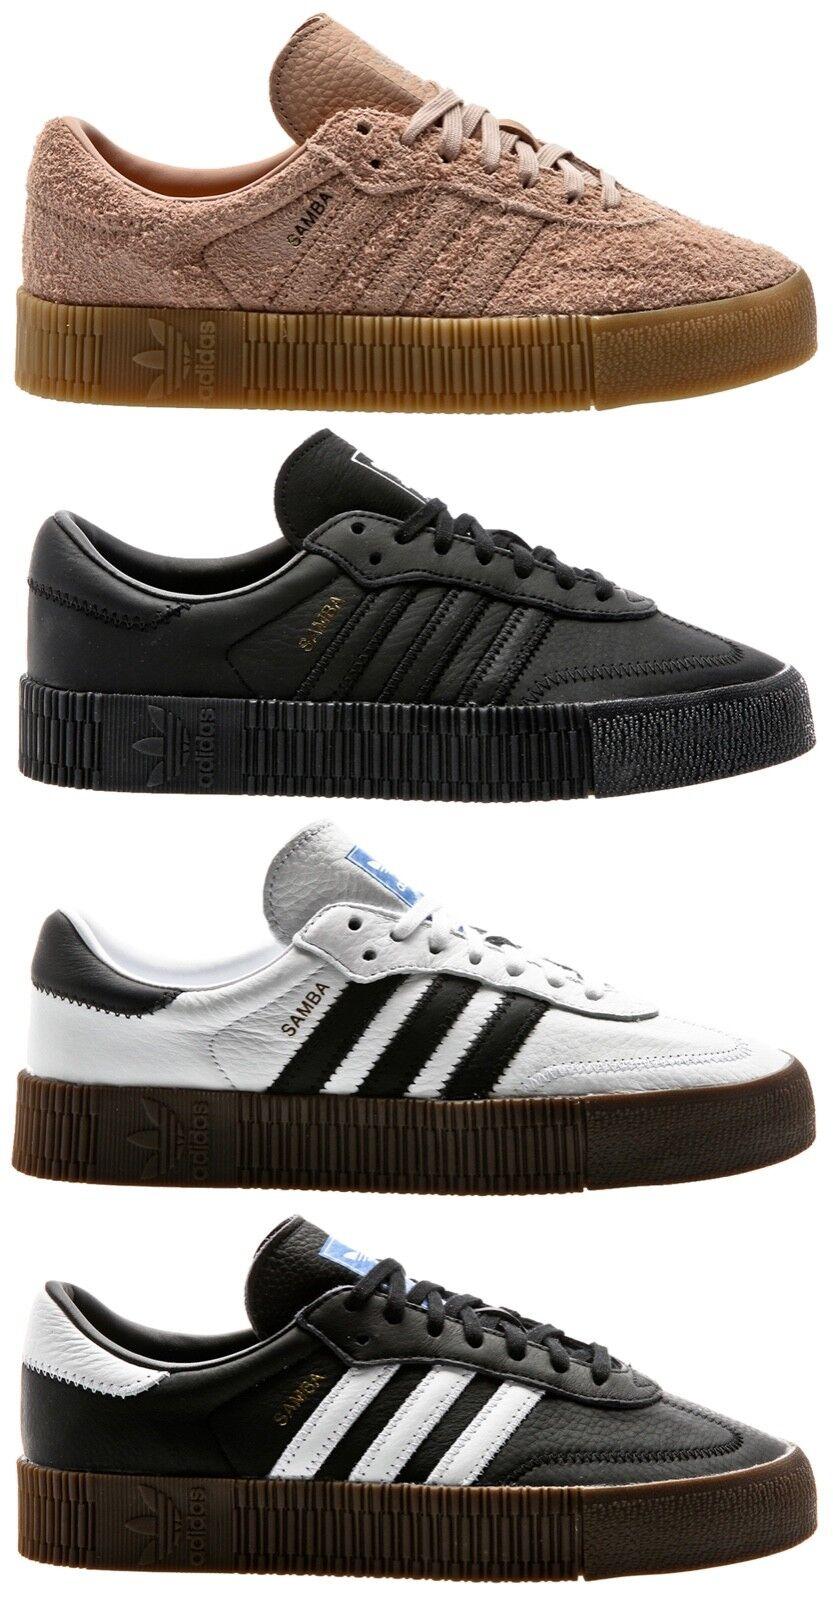 Adidas Originals Sambapink W Women Sneaker Women's shoes shoes